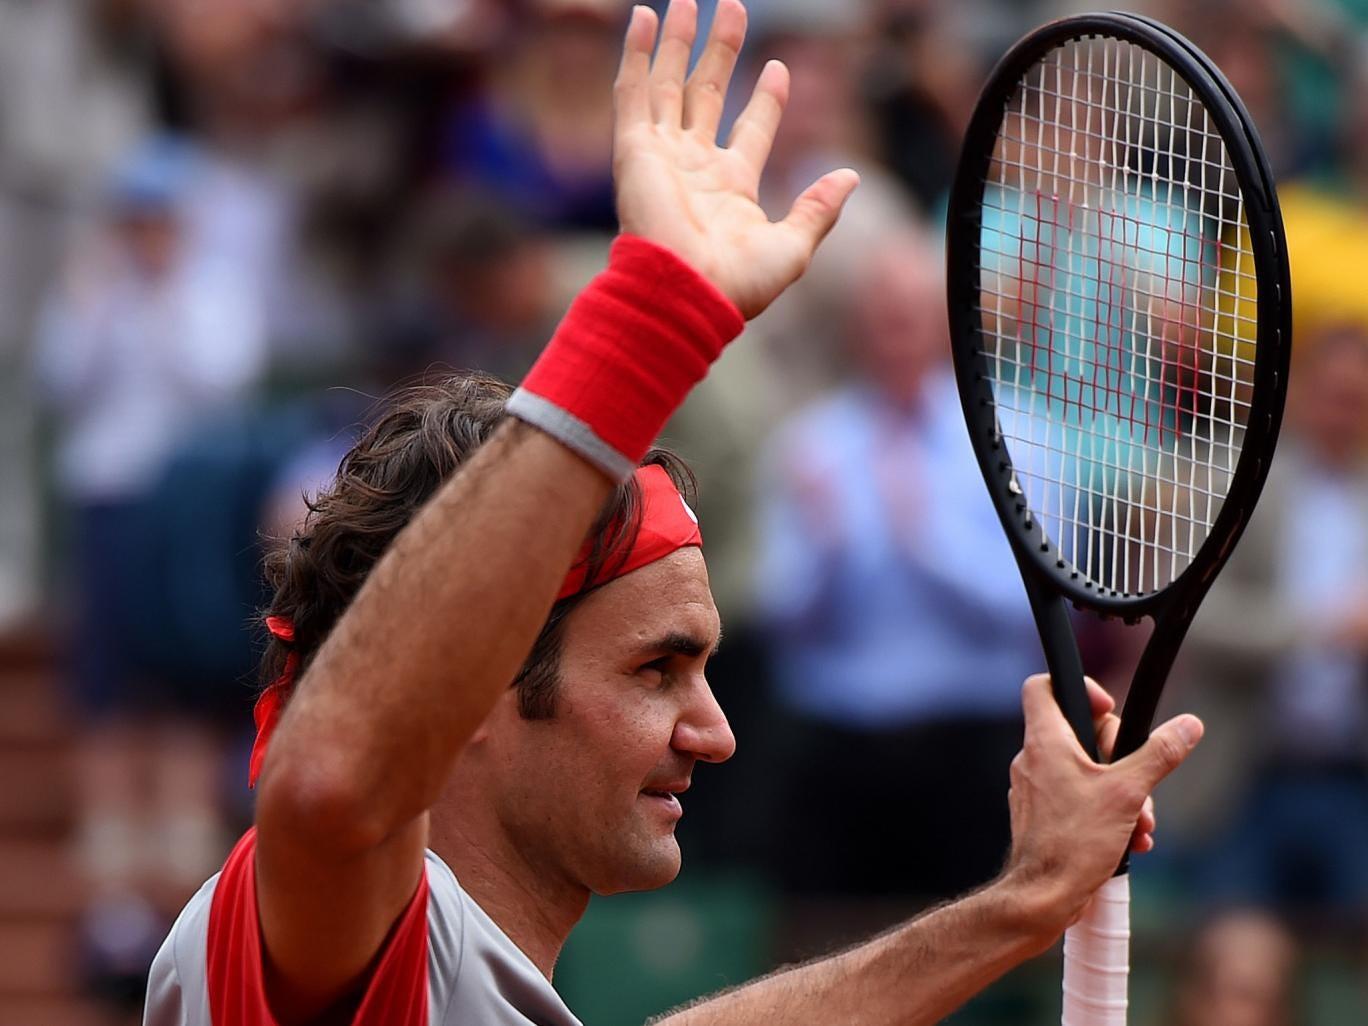 Roger Federer of Switzerland celebrates victory over Lukas Lacko